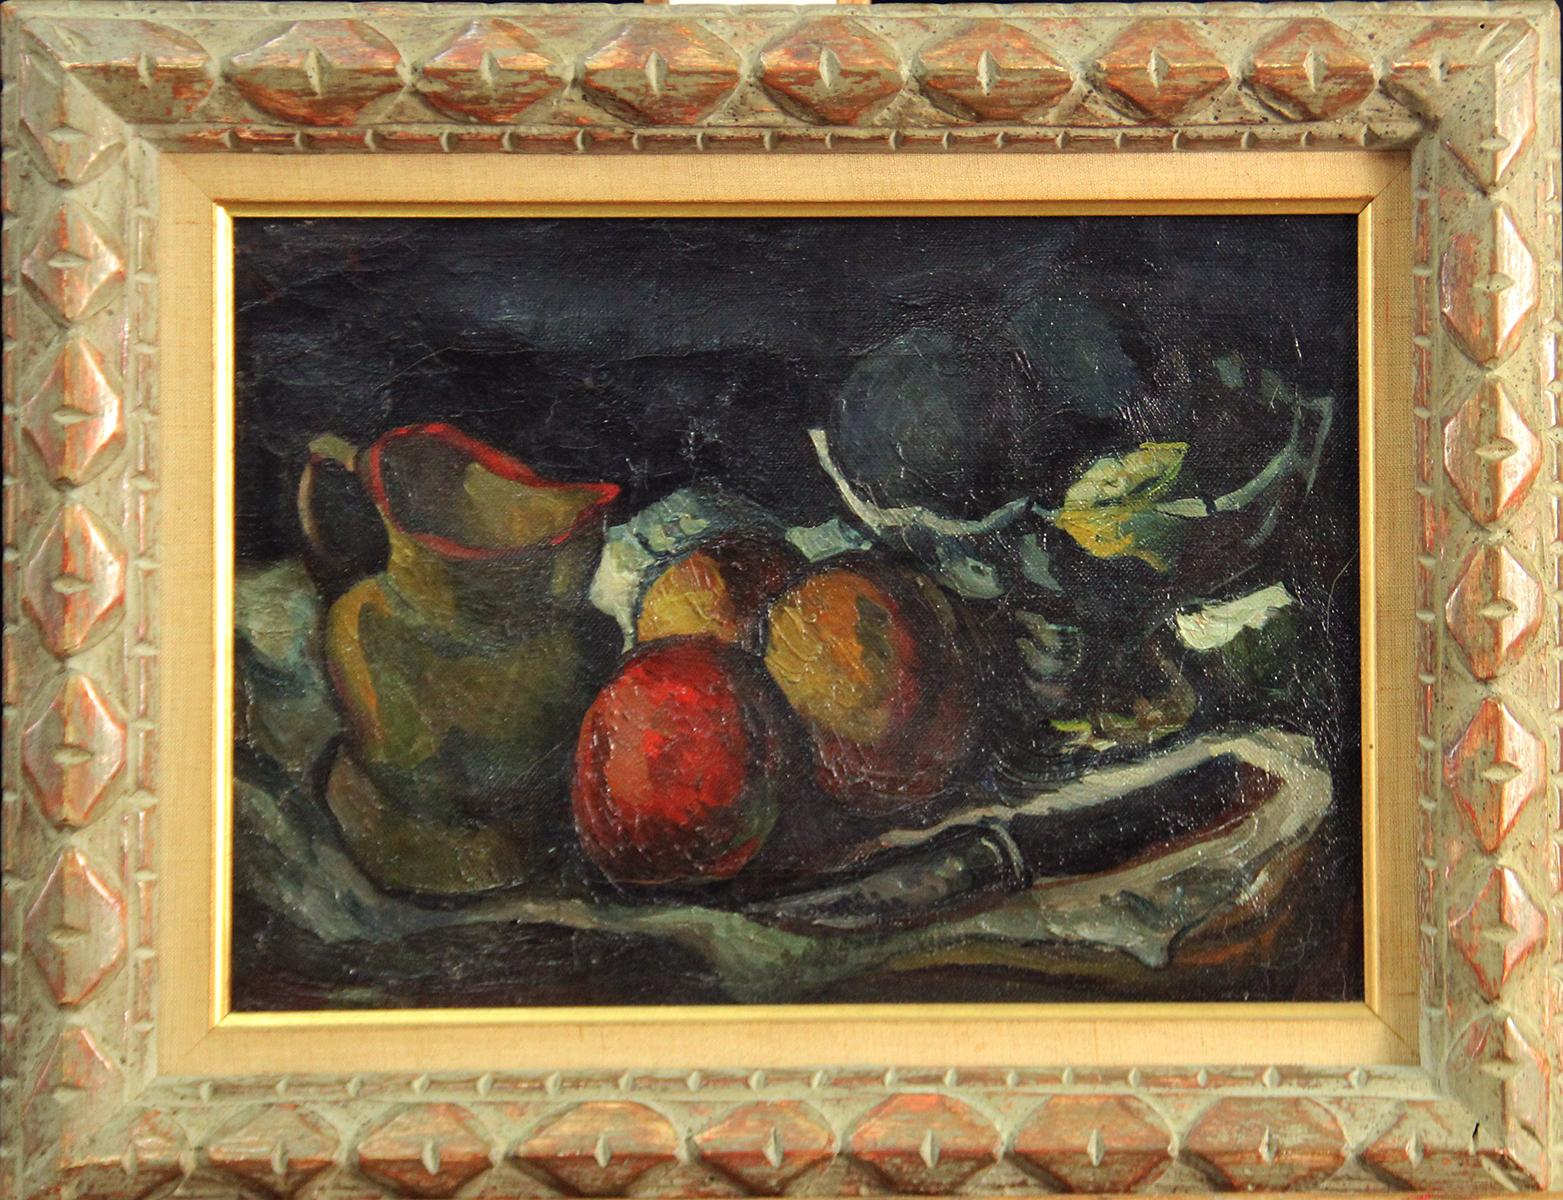 Fruit and Paring Knife, Modernist Still Life, Oil on Canvas, 1923, Framed